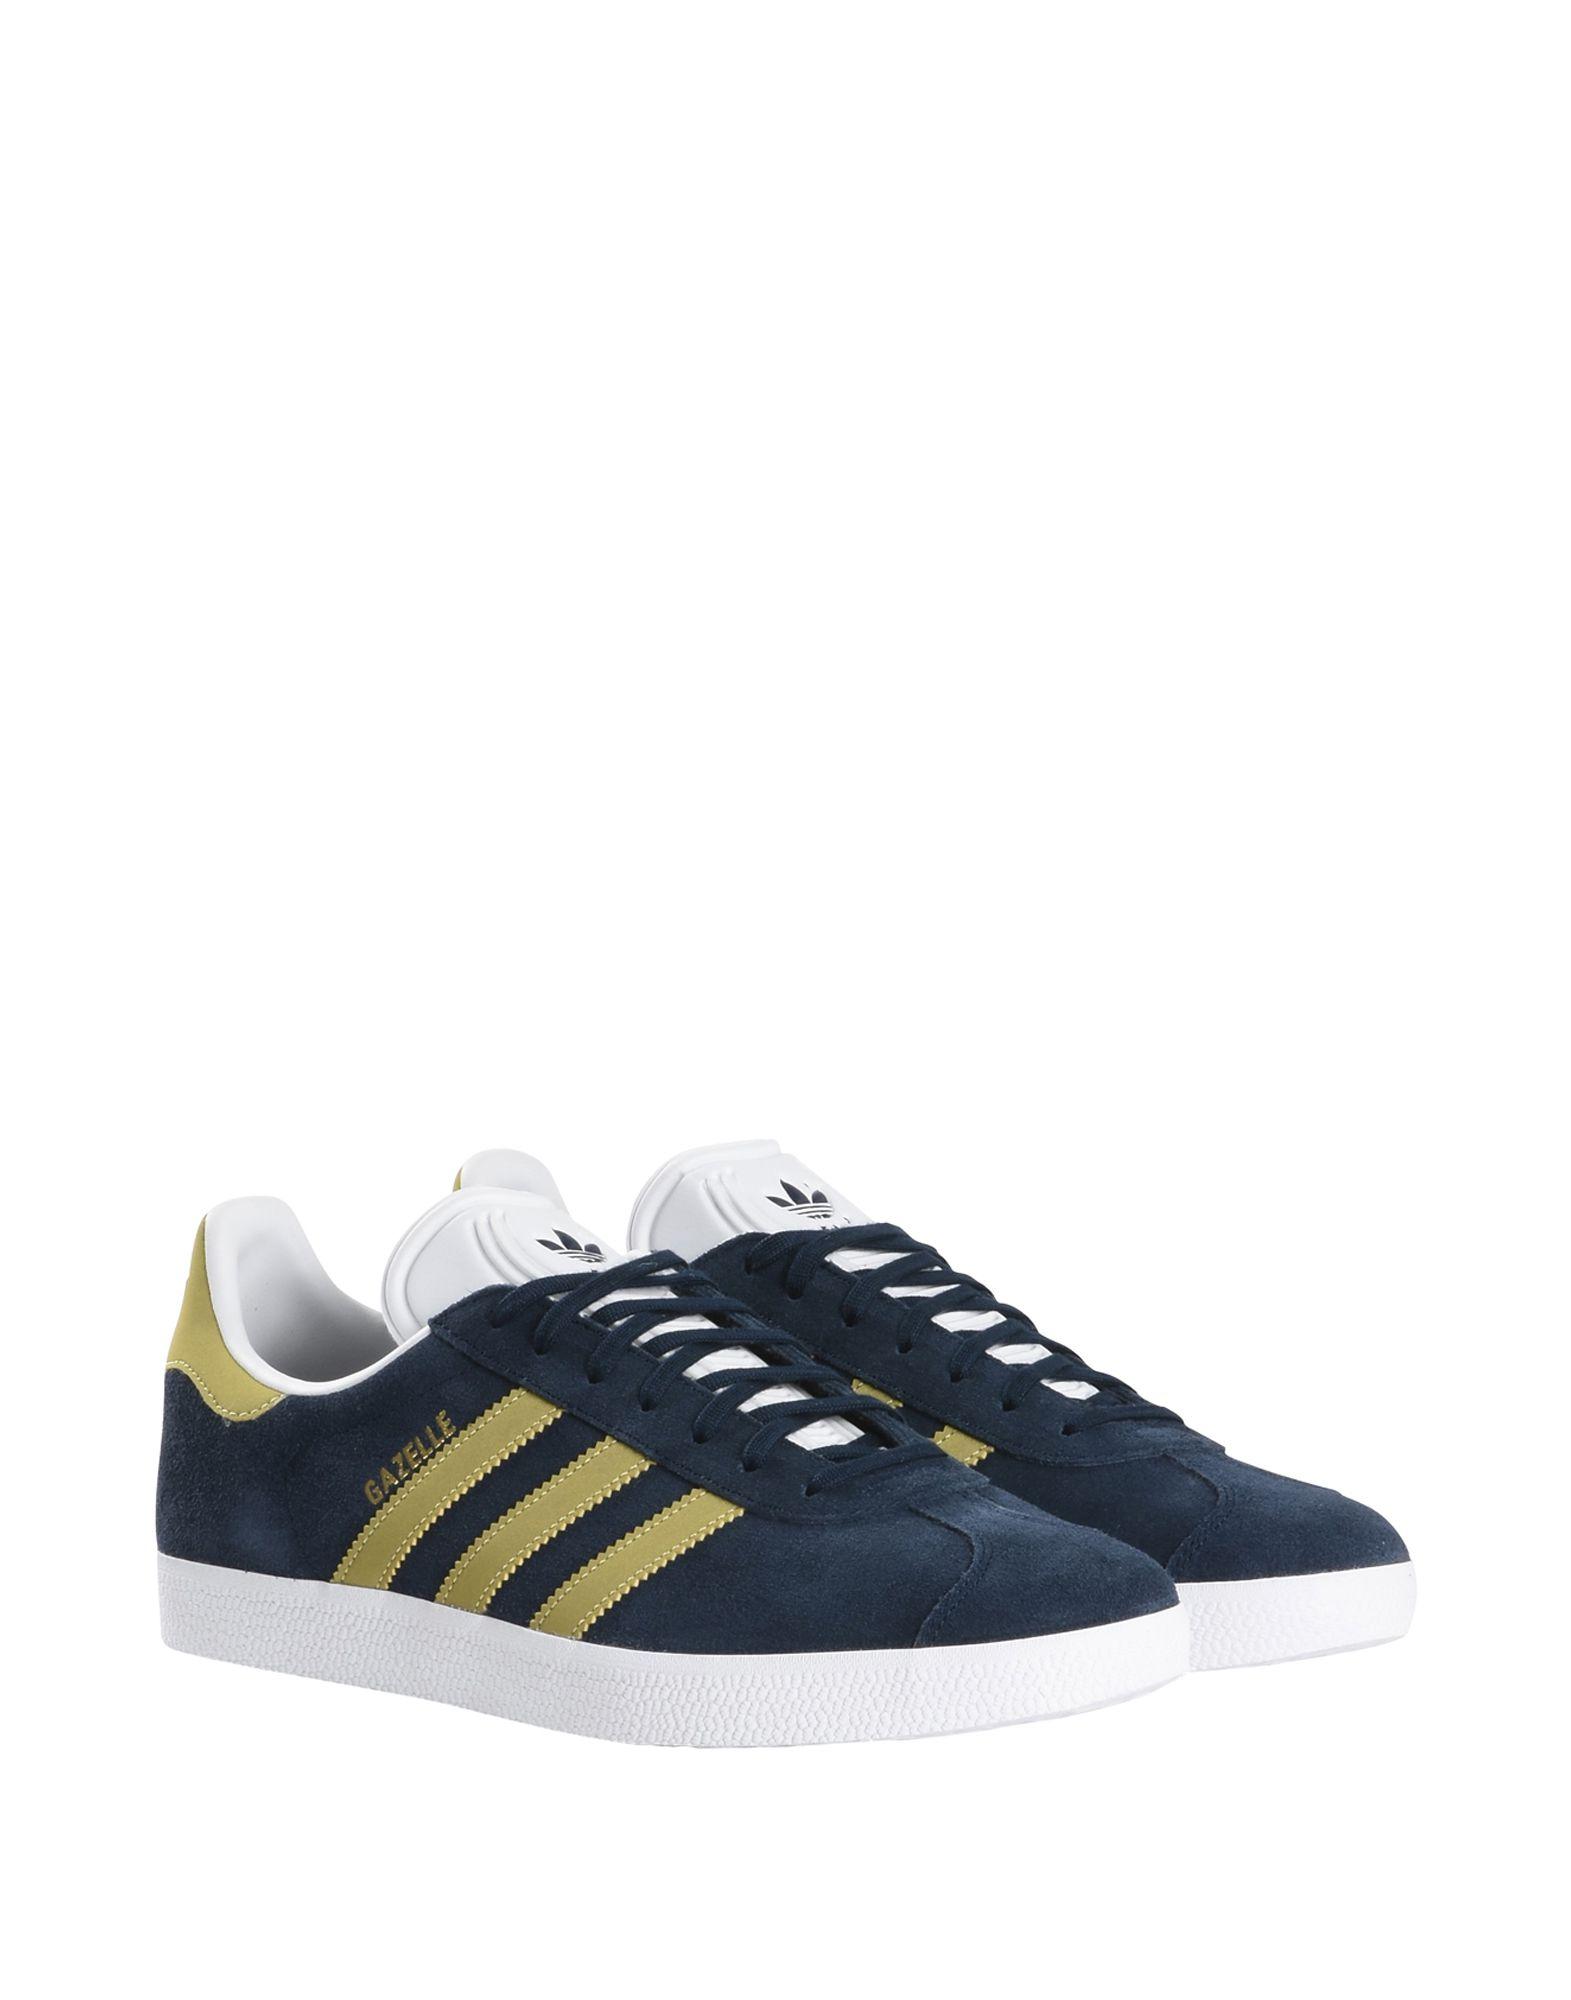 Rabatt echte Schuhe Adidas  Originals Gazelle  Adidas 11371747OU 11eb17